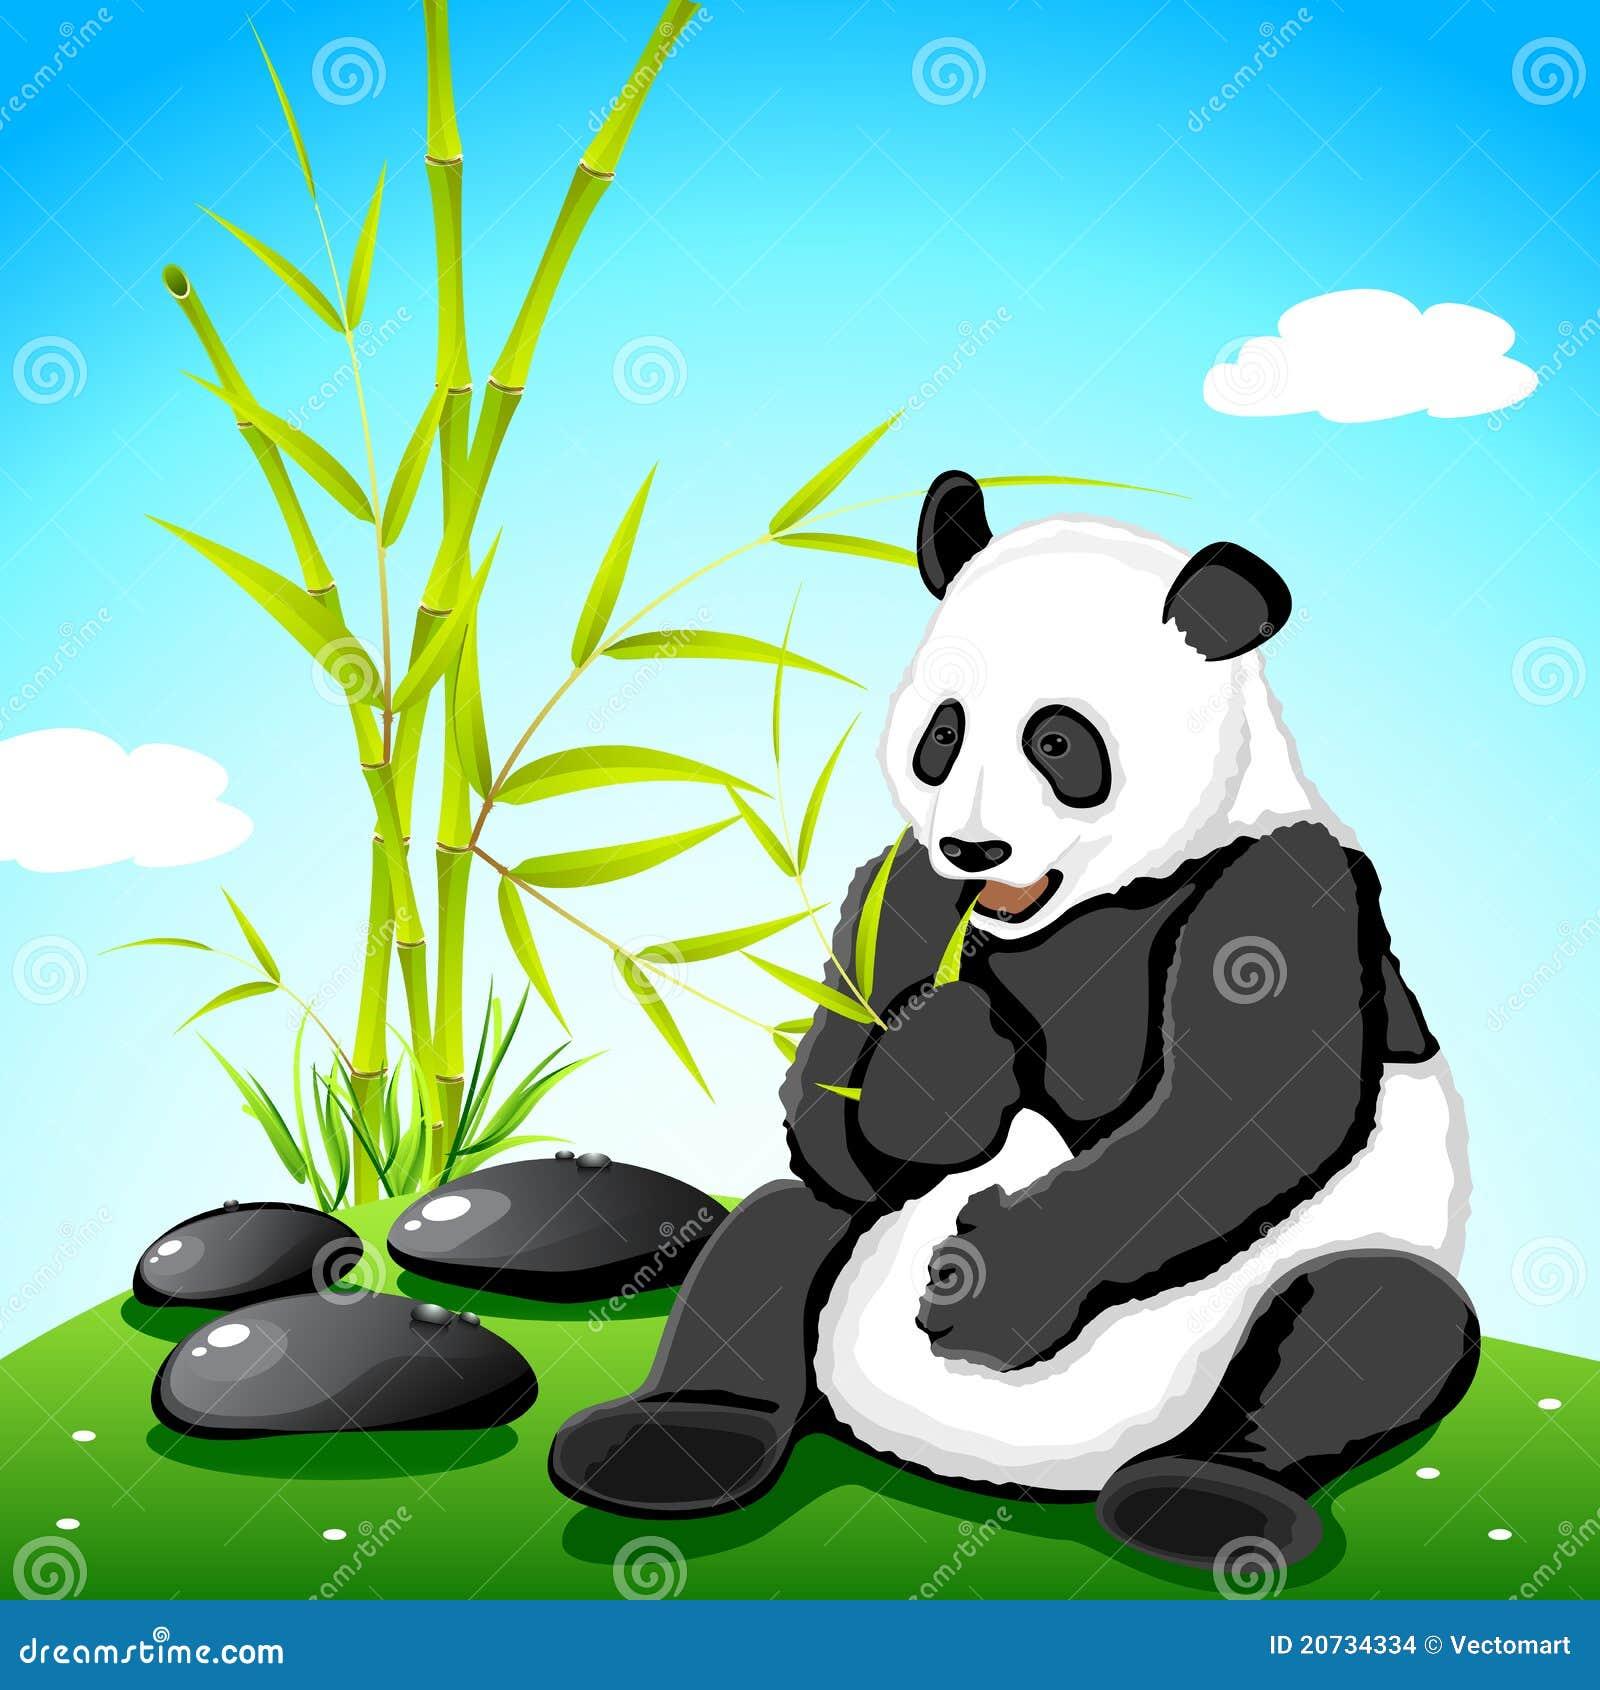 Panda Eating Bamboo Stock Vector Illustration Of Mammal 20734334